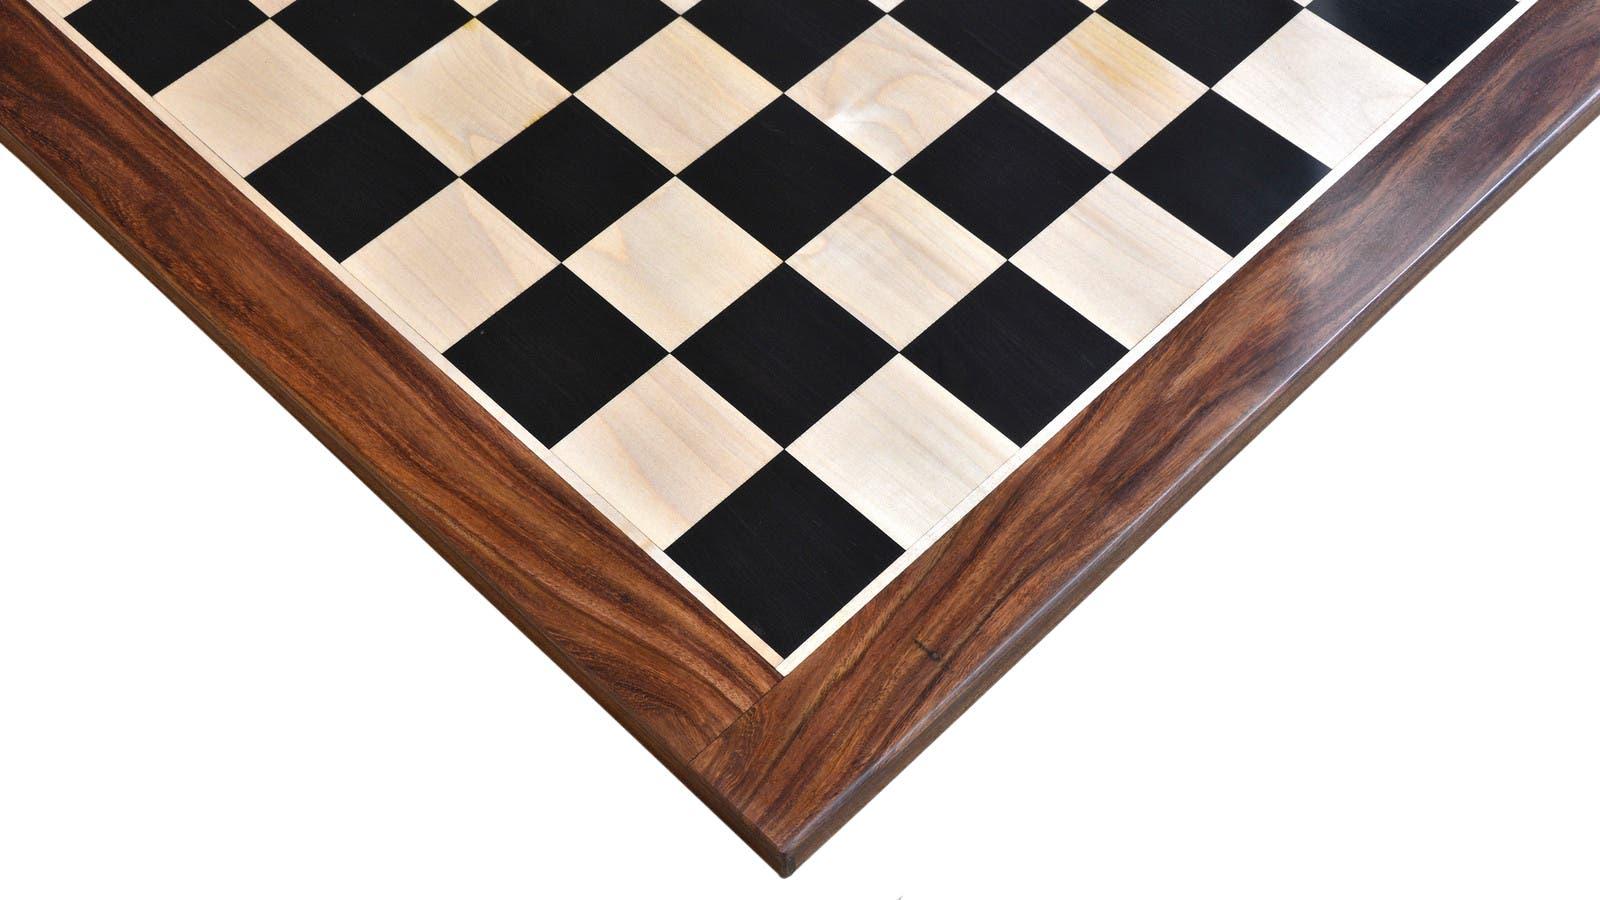 Ebony sheesham chess board